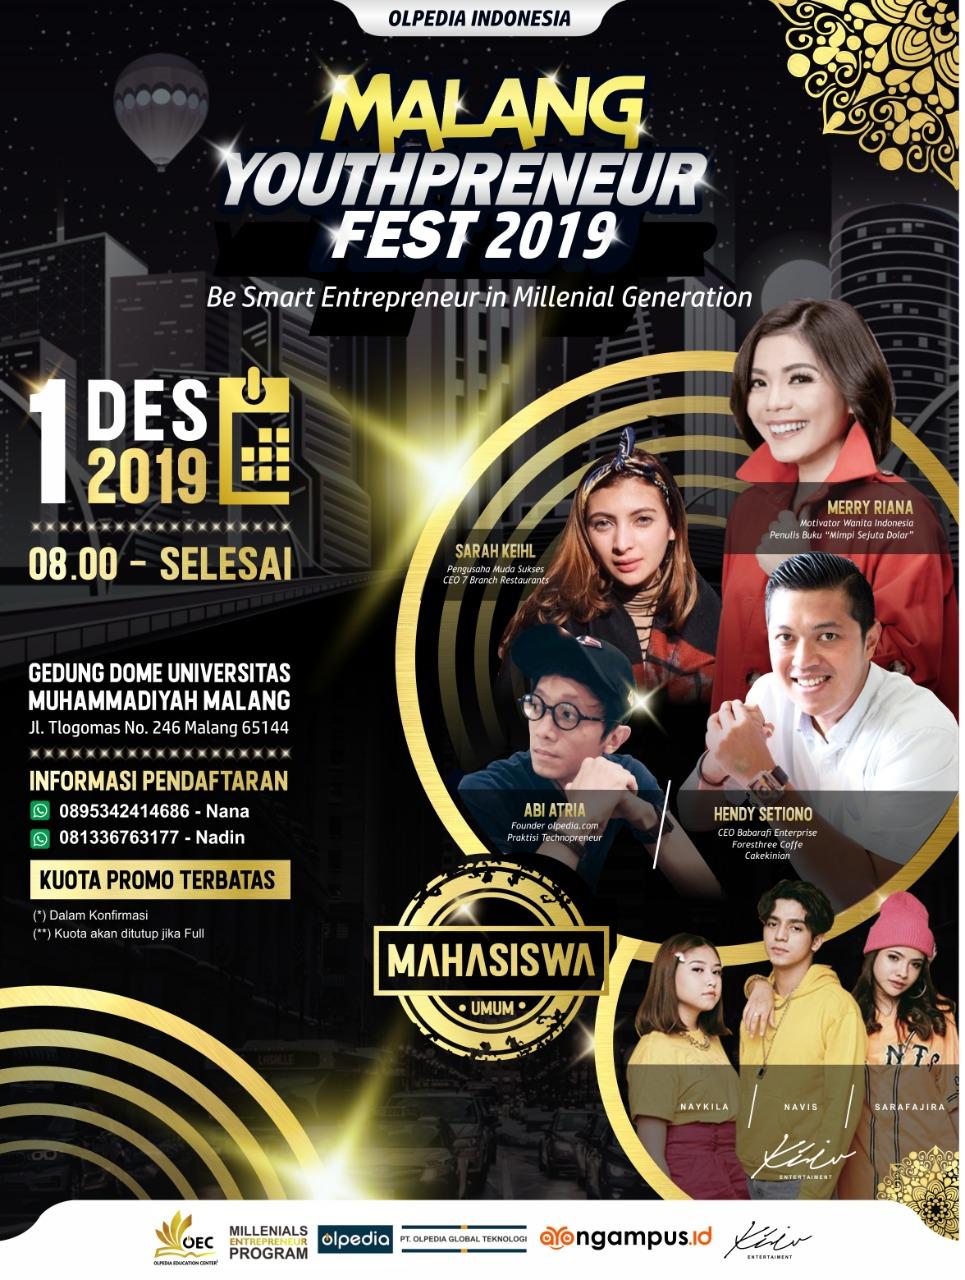 Flyer Malang Youthpreneur Fest 2019. (Foto: istimewa)